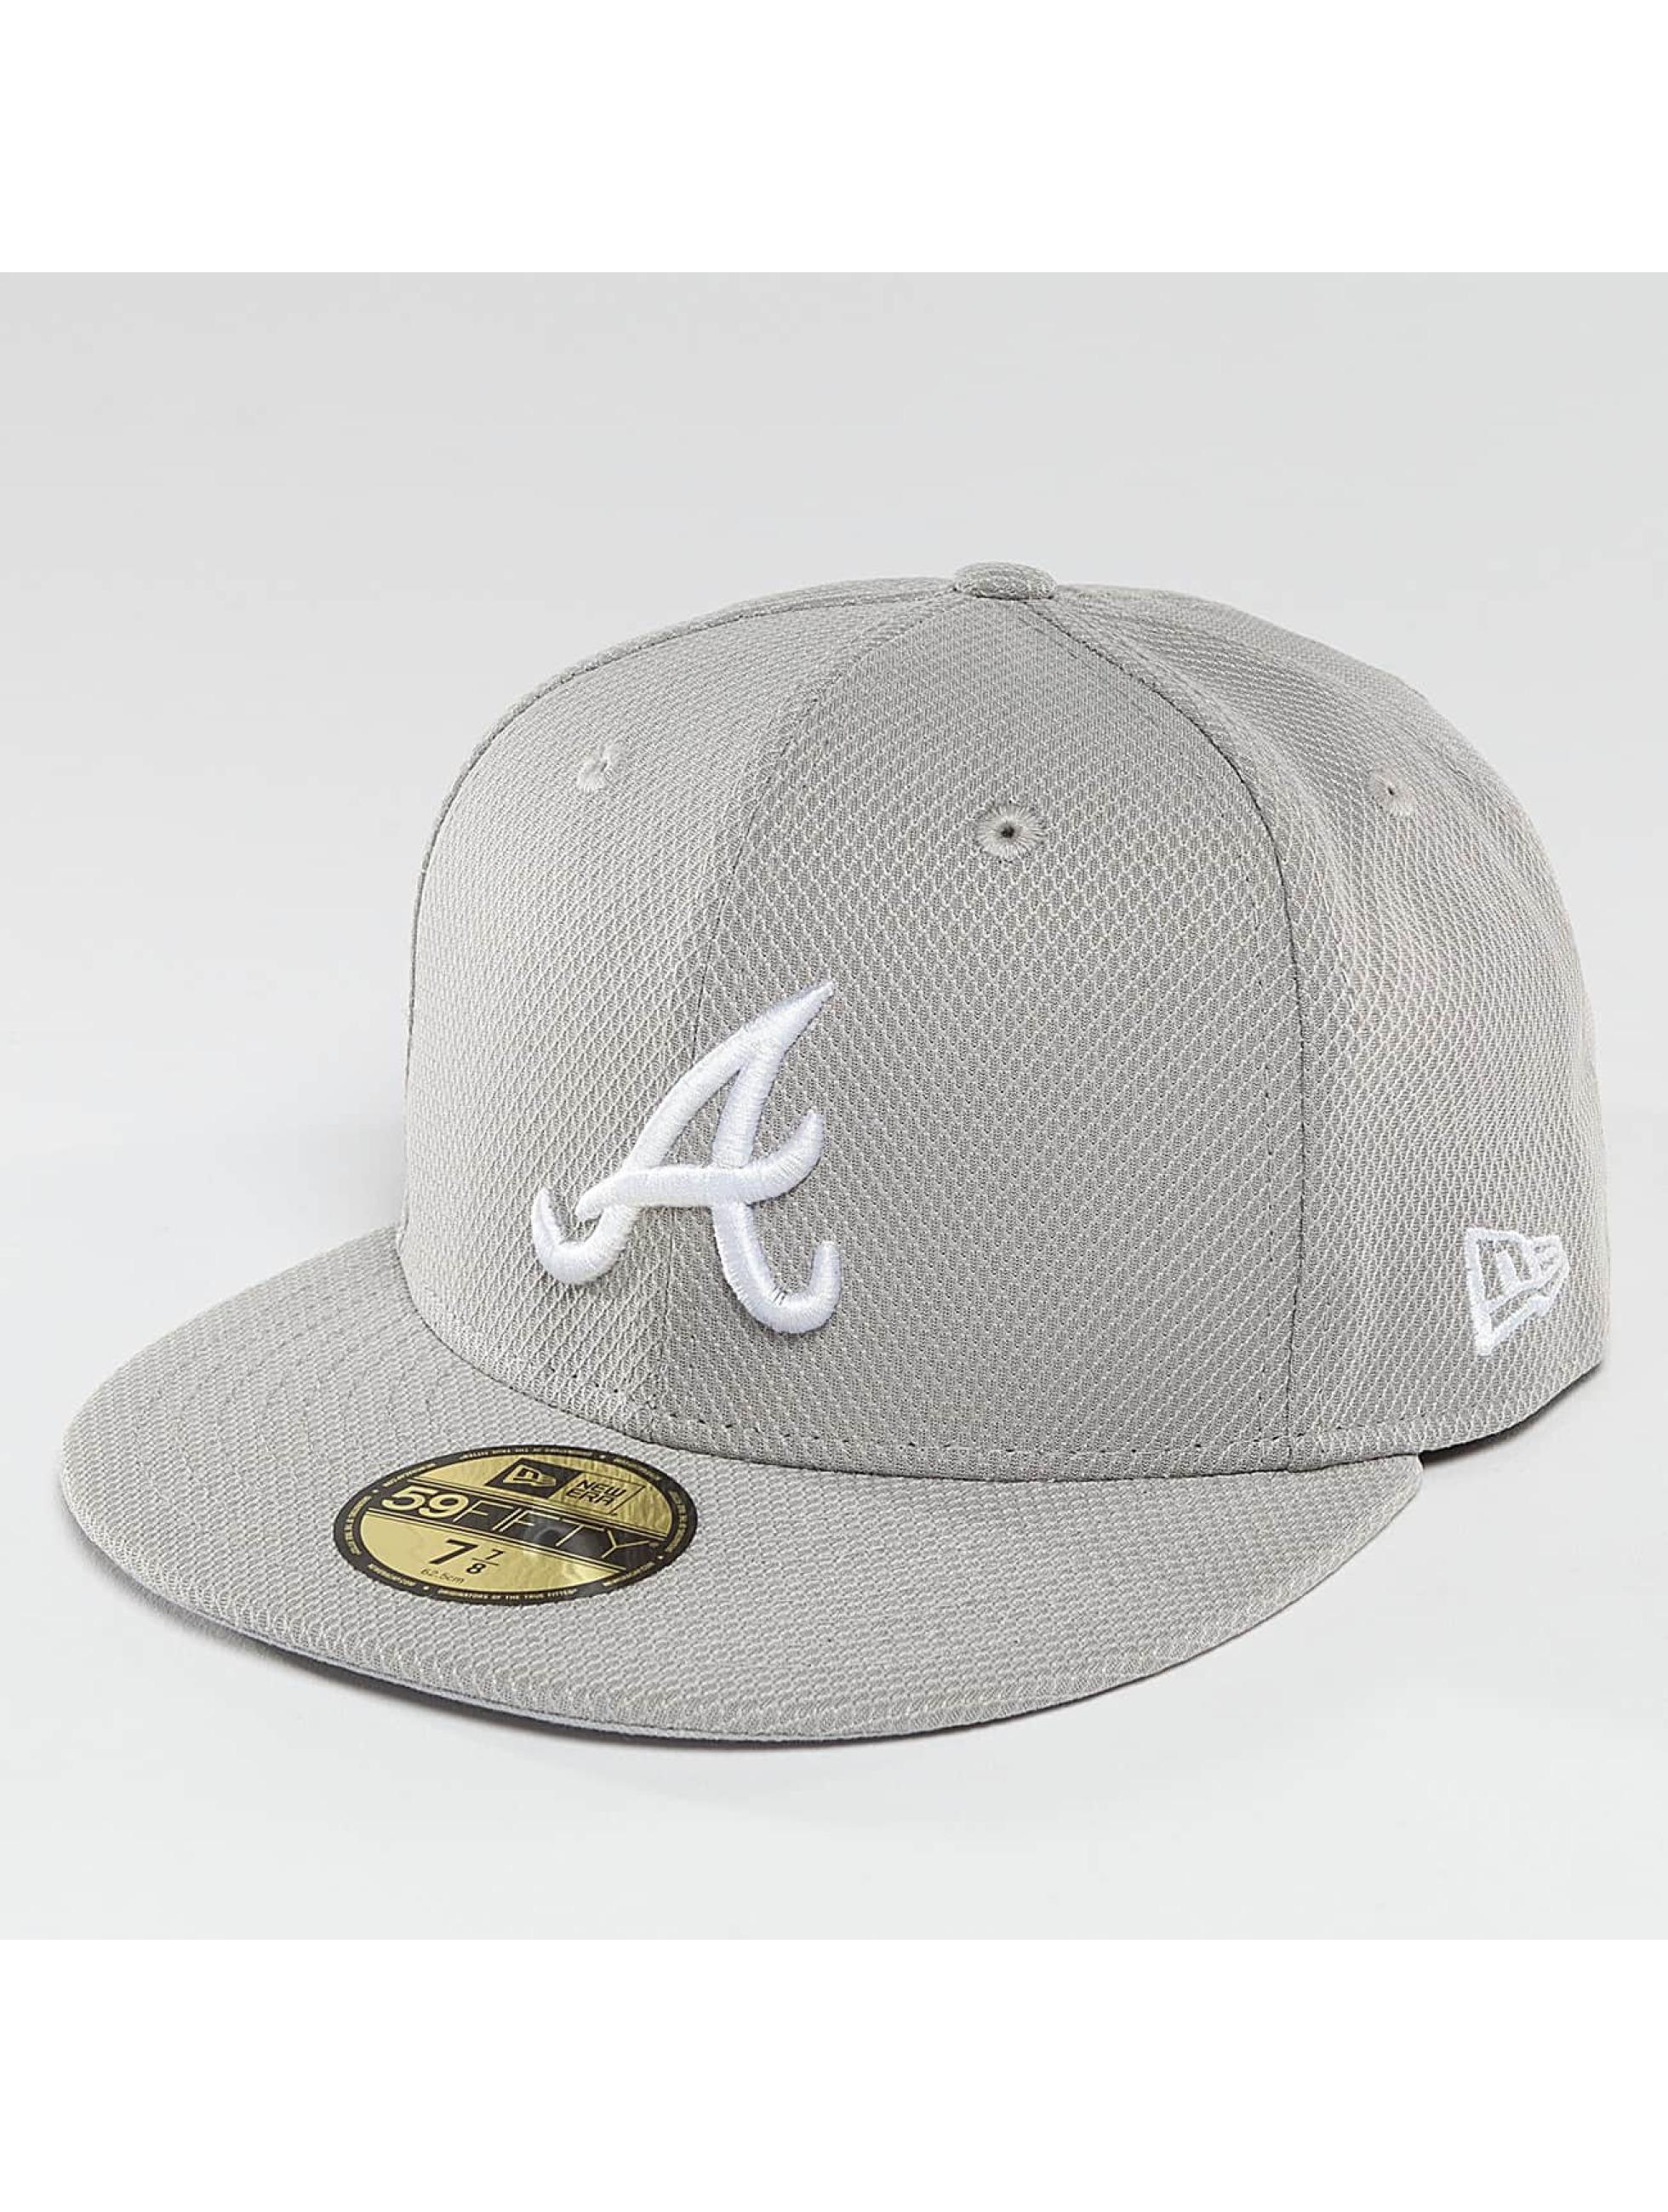 New Era Fitted Cap Diamond Era Essential Atlanta Braves 59Fifty šedá